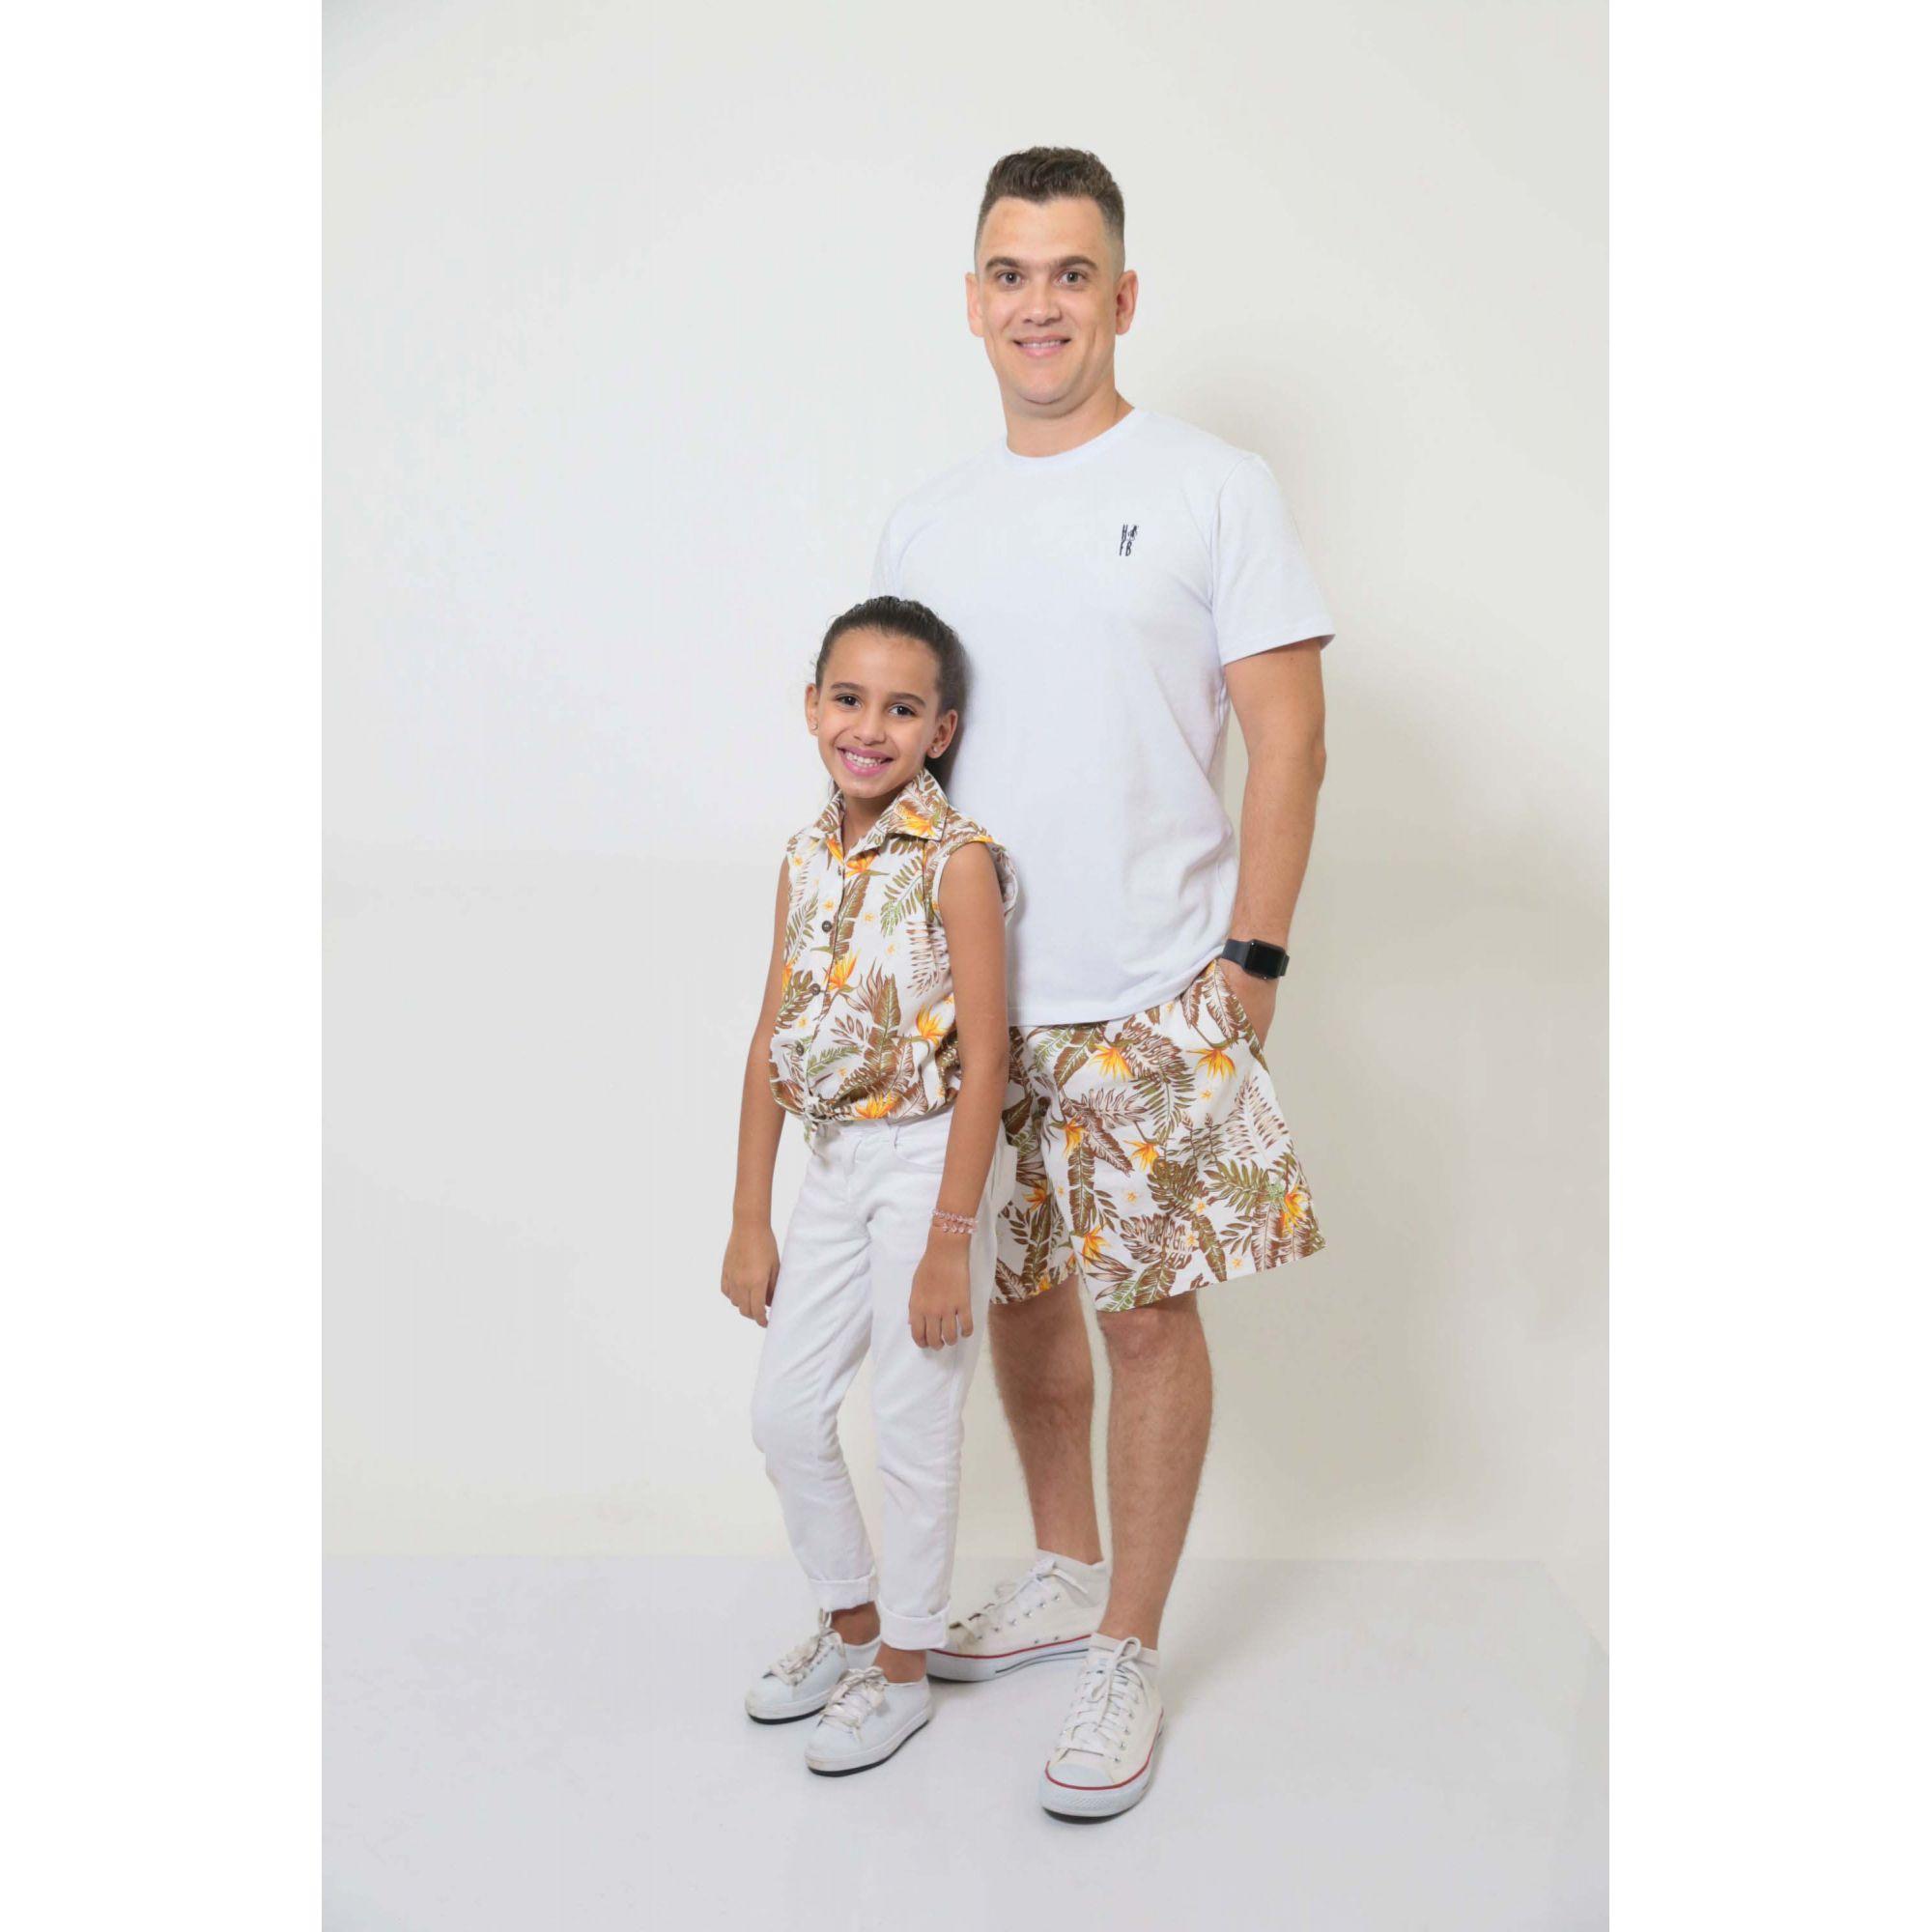 PAI E FILHA > Bermuda Masculina + Camisa Feminina Infantil Amazonas [Coleção Tal Pai Tal Filha]  - Heitor Fashion Brazil